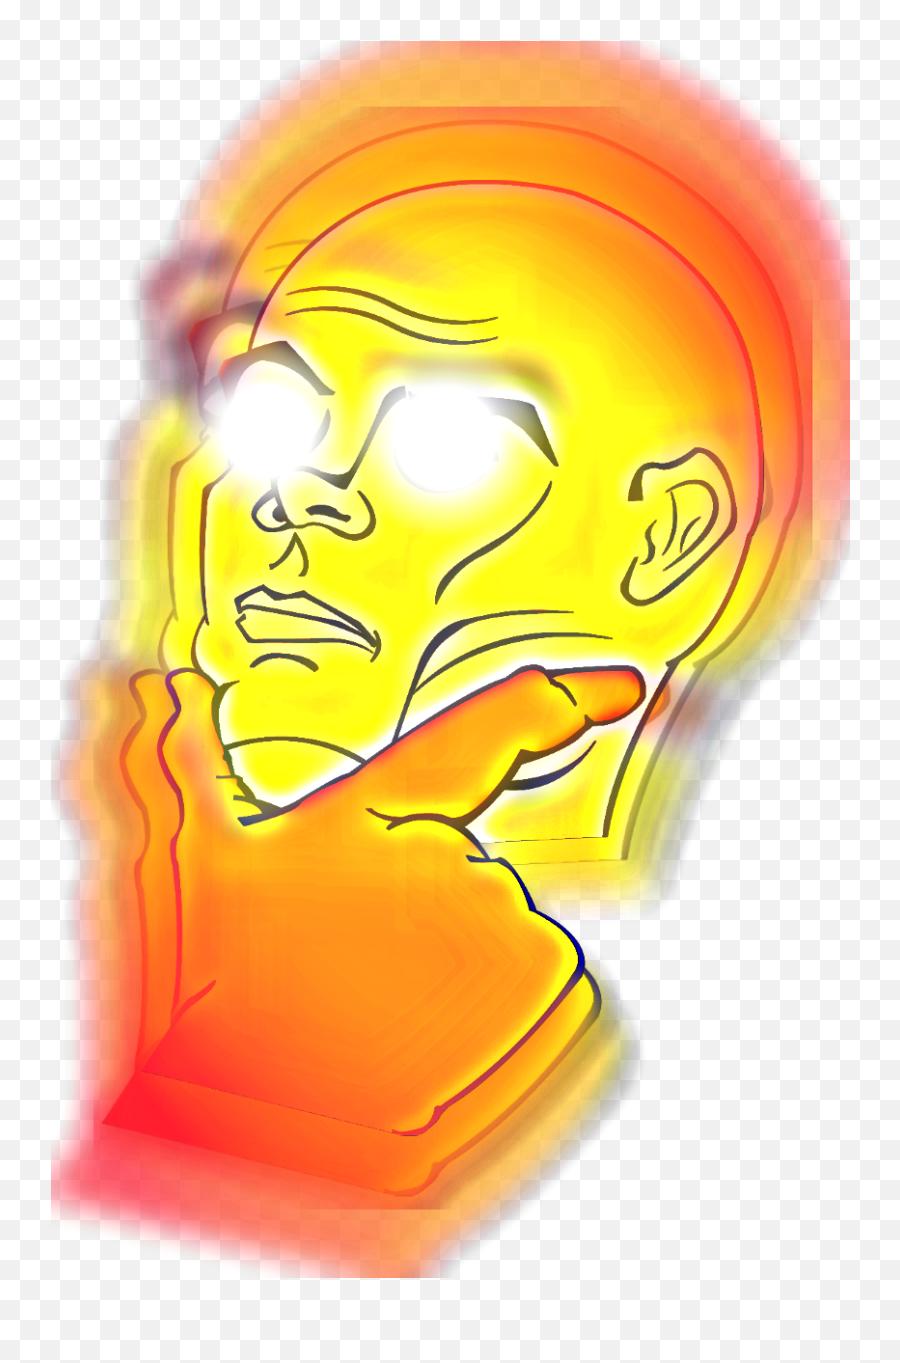 Hyper Real Think - Meme Emojis For Discord,Think Emoji Meme